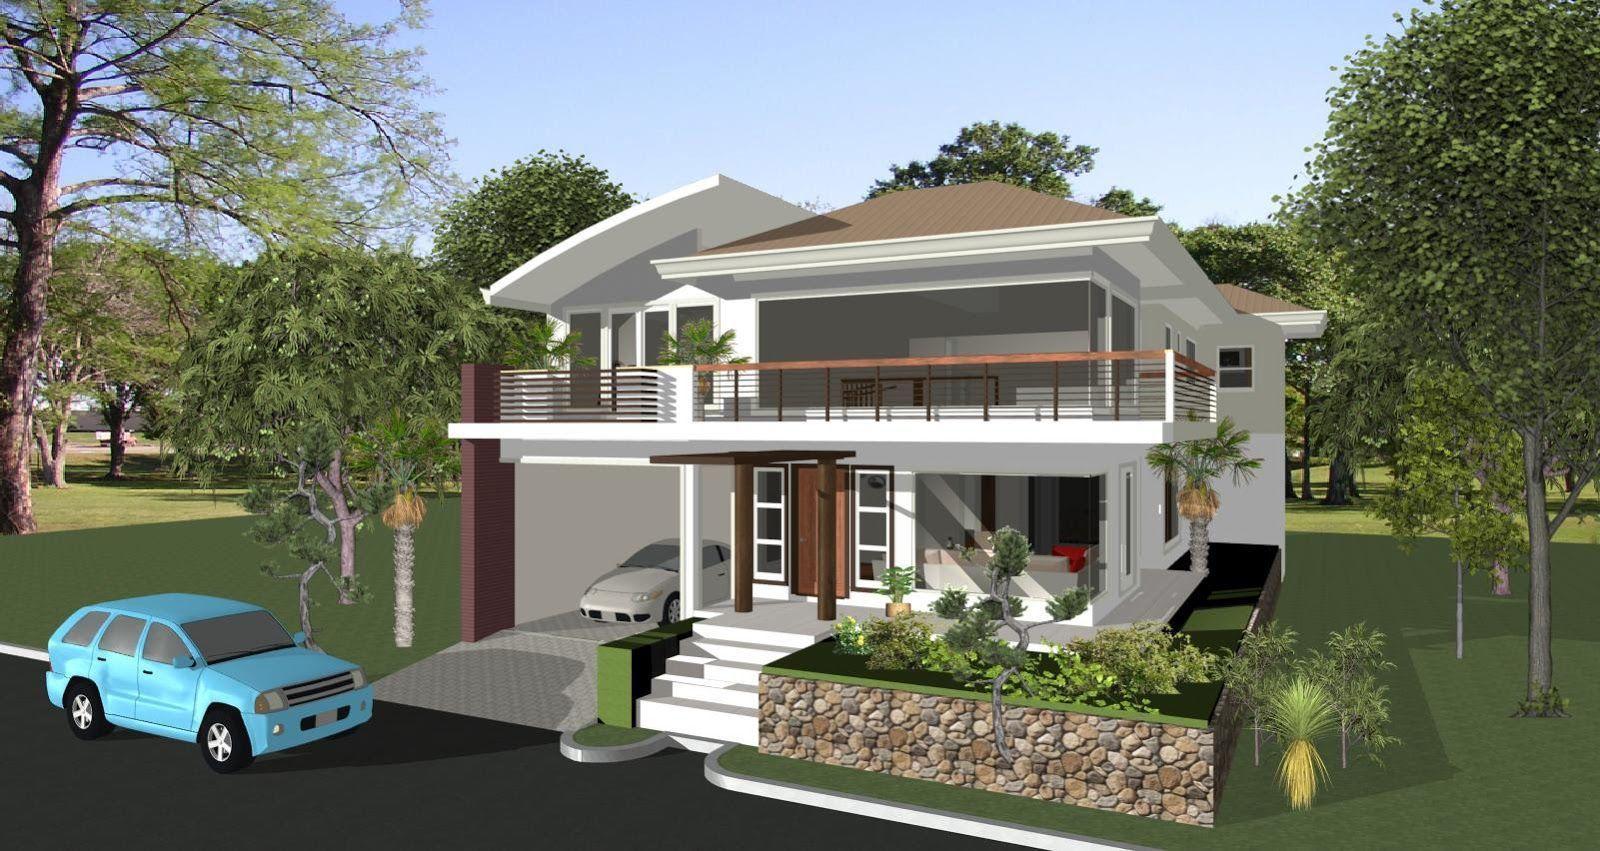 42 Simply Elegant House Design Ideas Roundecor Philippines House Design Small House Exteriors Modern House Plans